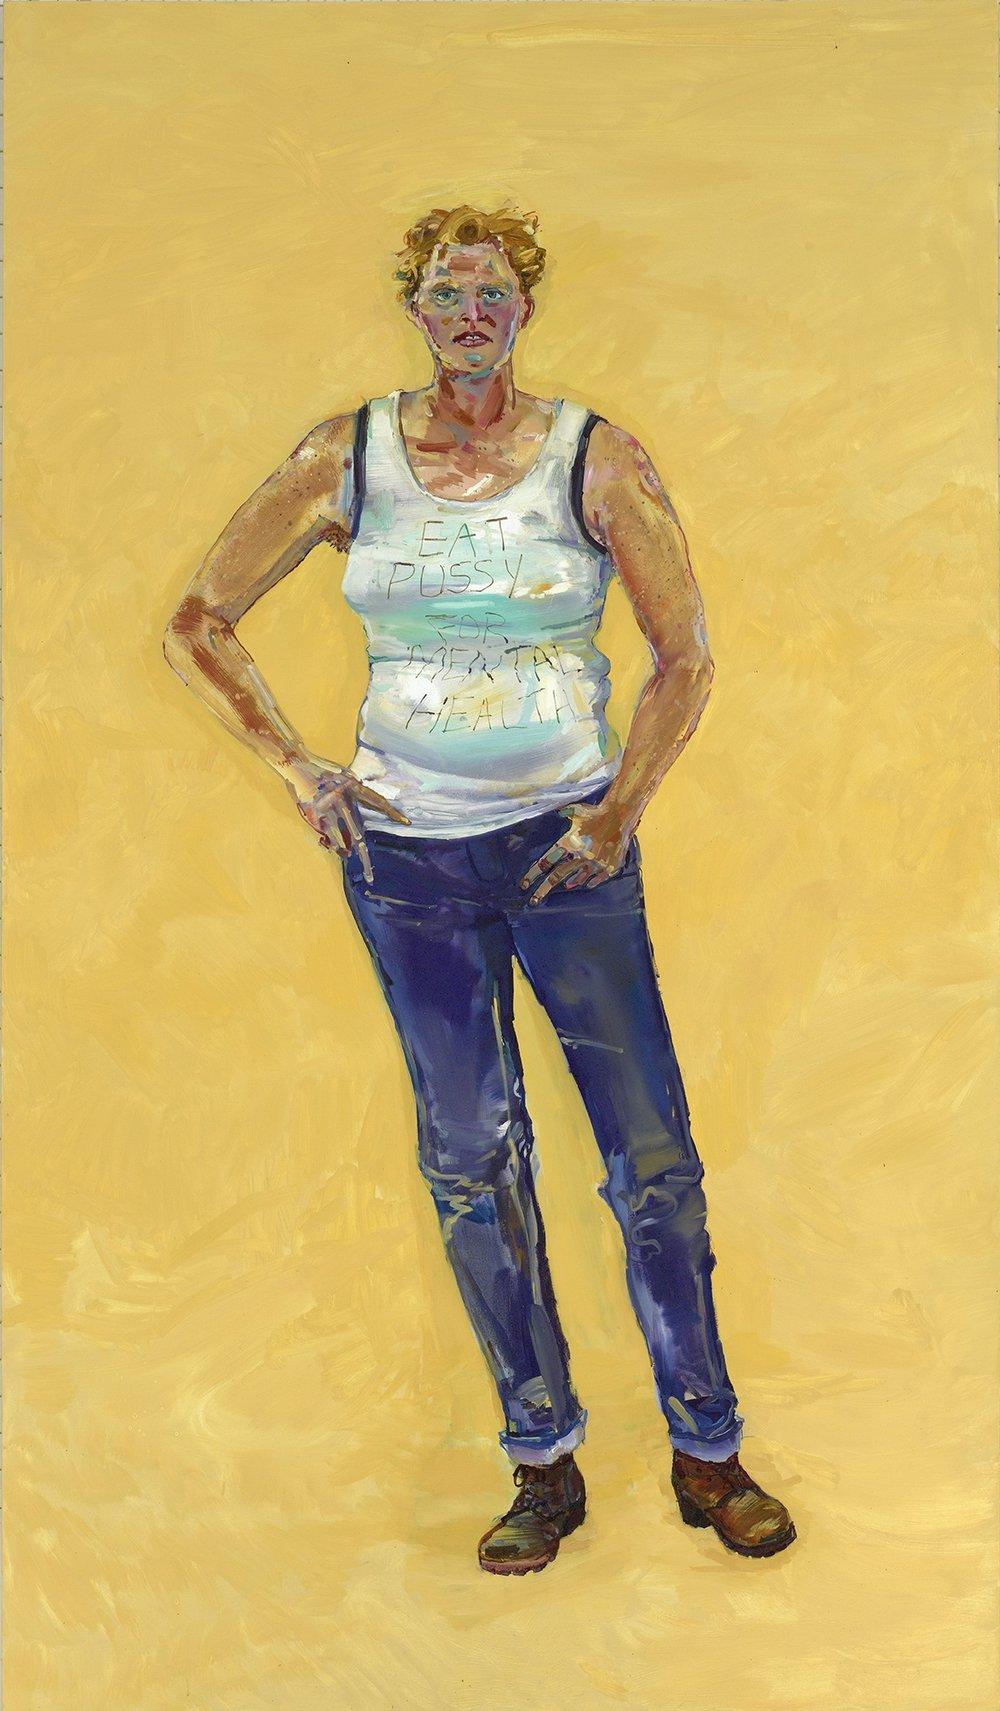 Elizabeth Tubergen